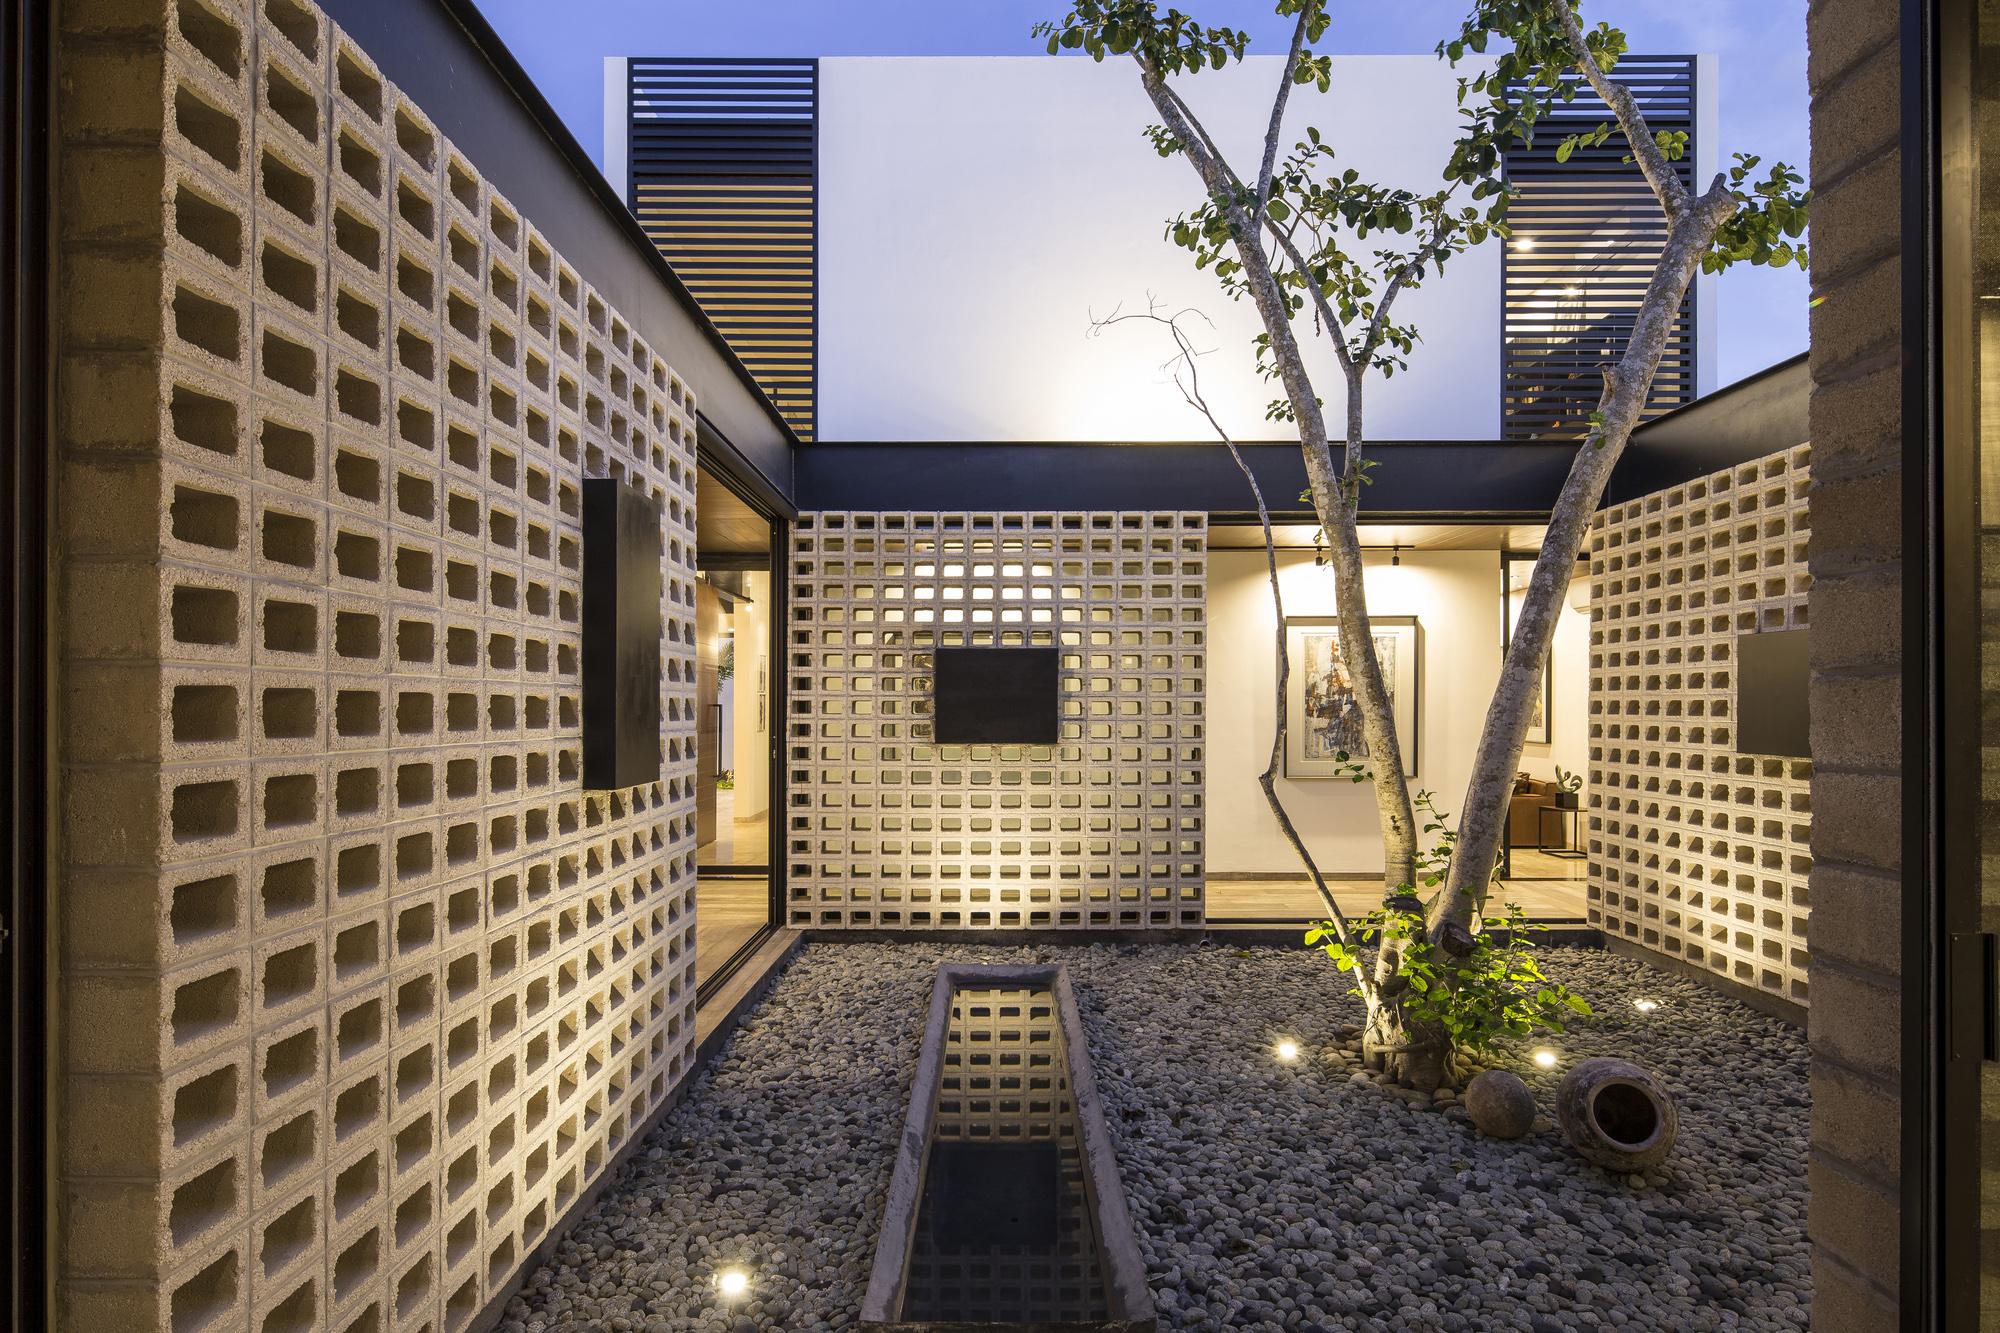 Un Patio / P11 Arquitectos - Fotografia: EDUARDO CALVO SANTISBON